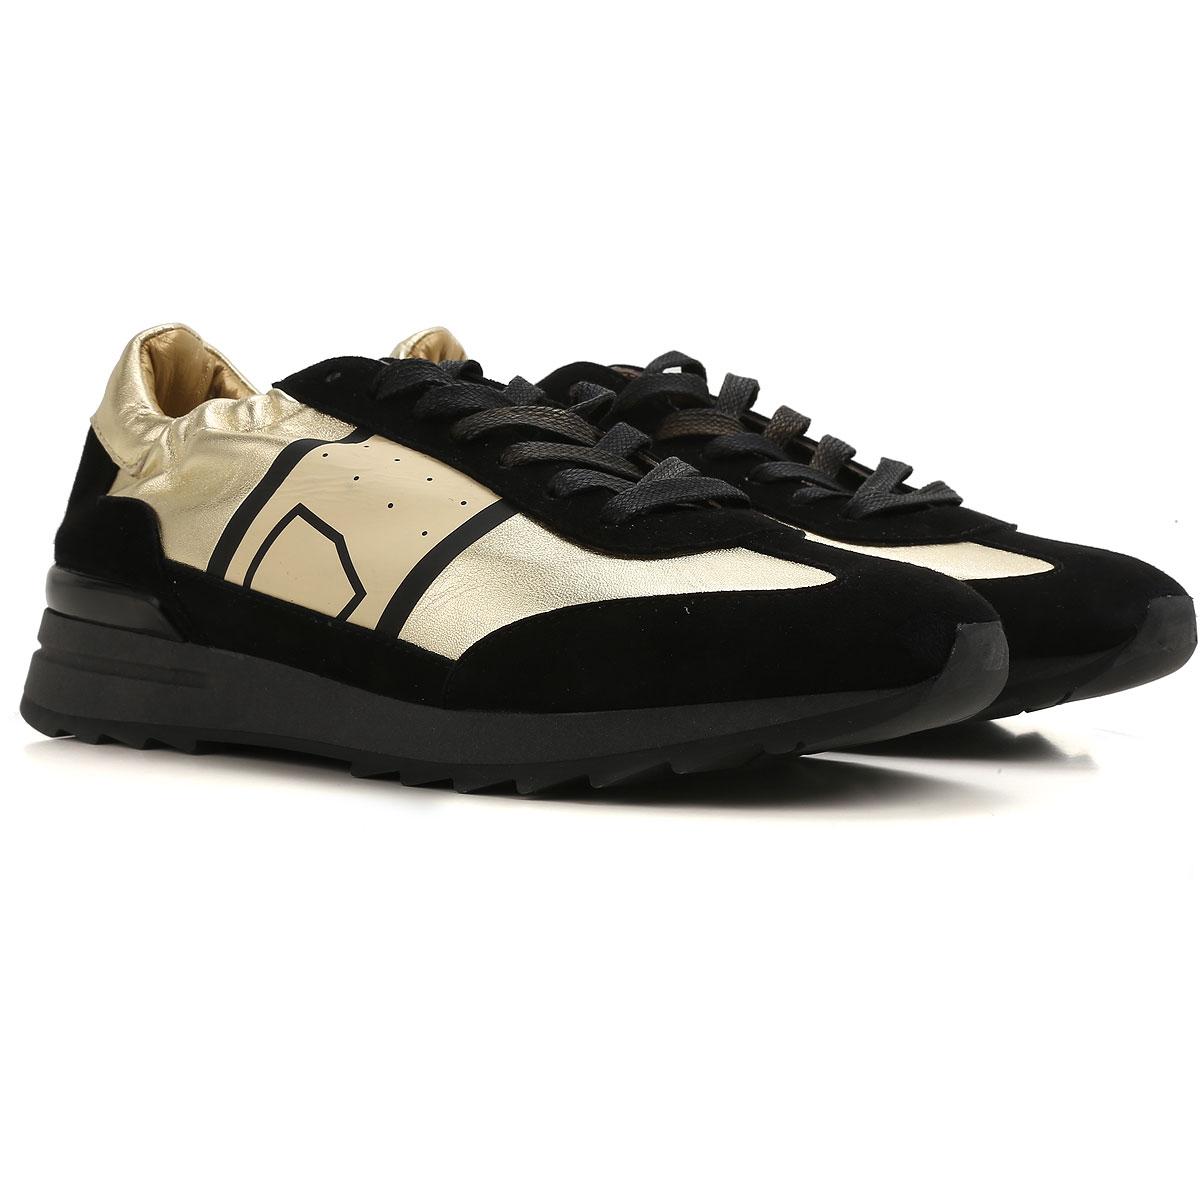 Philippe Model Sneaker Donna In Saldo, Oro, pelle, 2019, 36 37 38 40 41